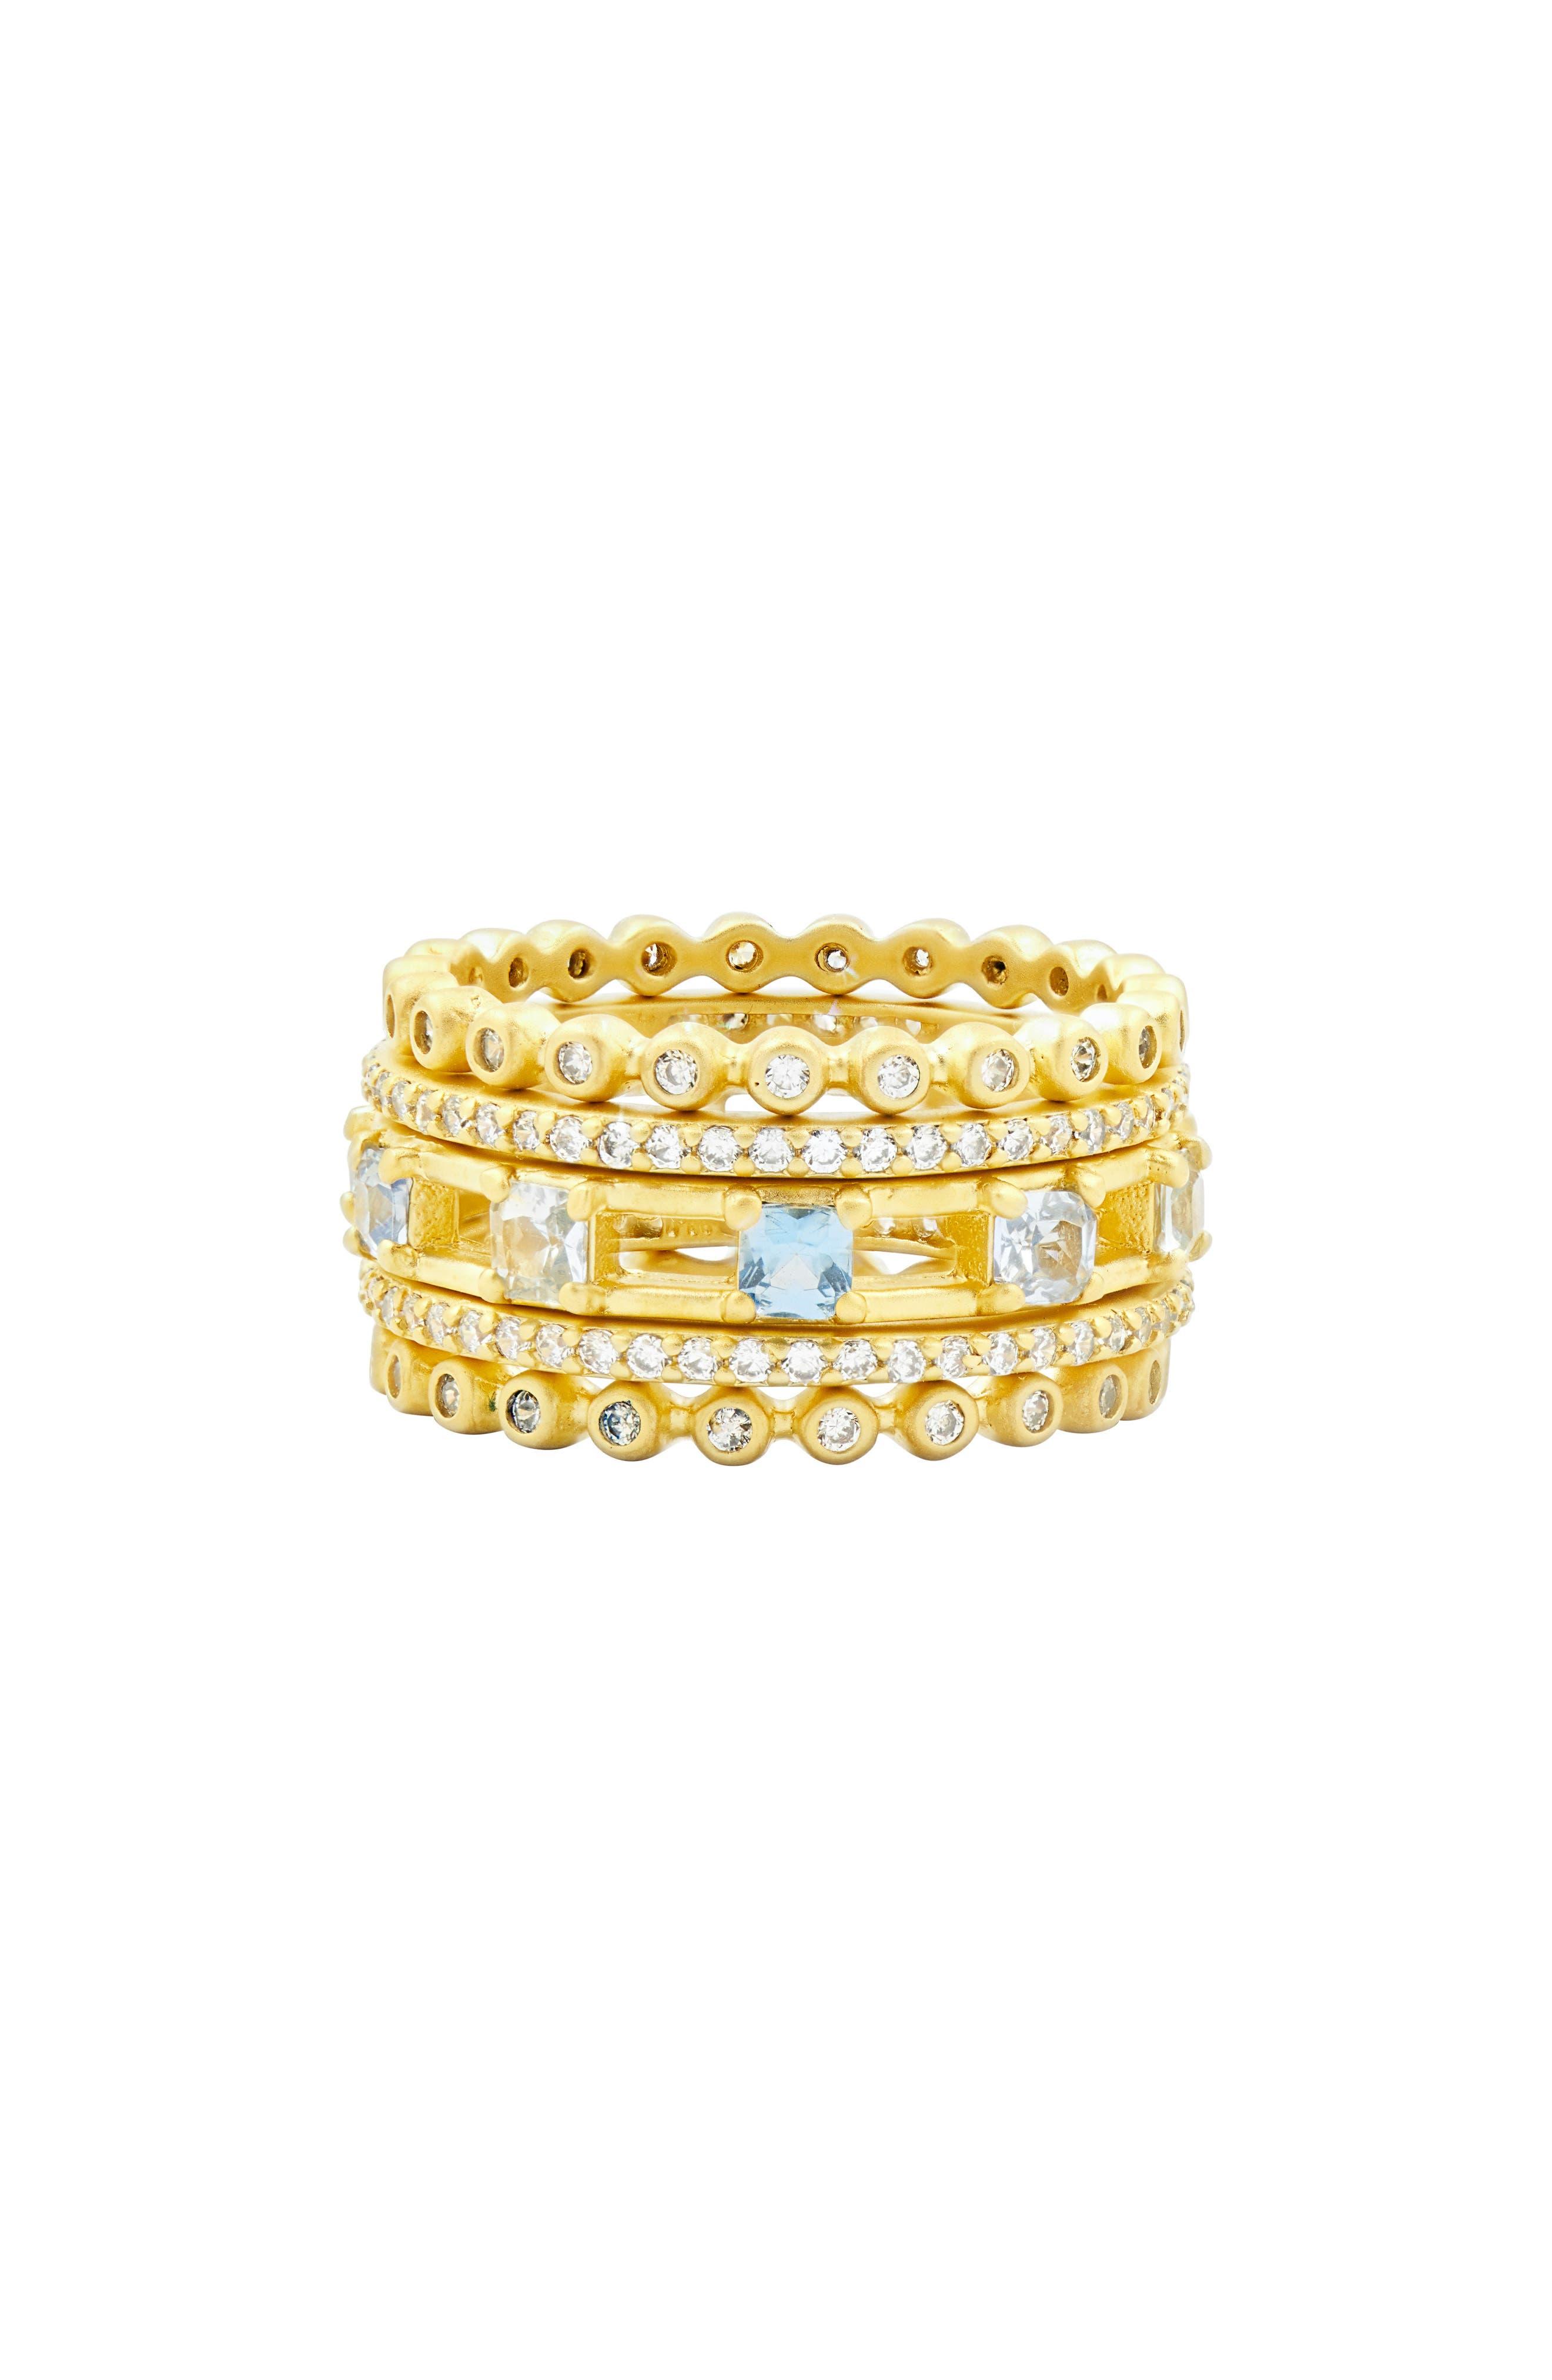 Alternate Image 1 Selected - FREIDA ROTHMAN Ocean Azure Cubic Zirconia Ring